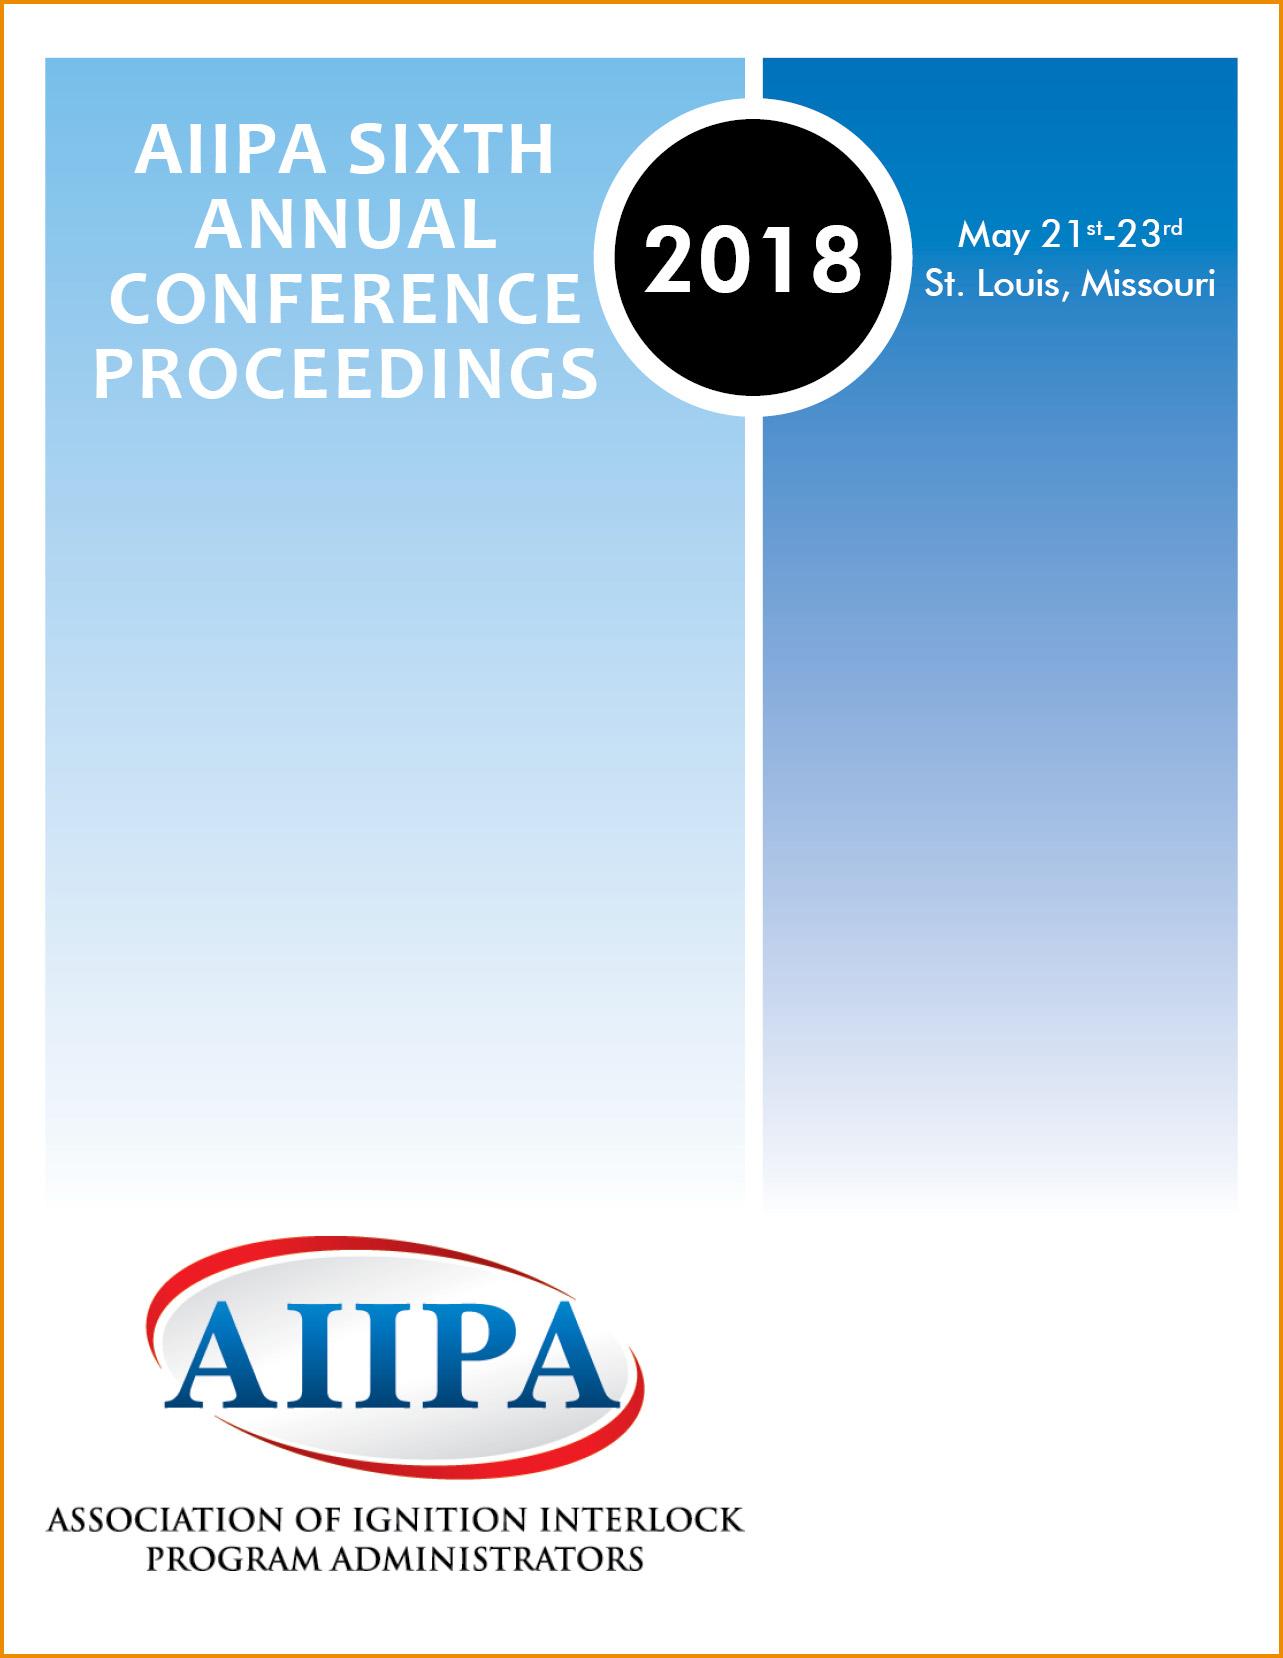 AIIPA Sixth Annual Conference Proceedings 2018